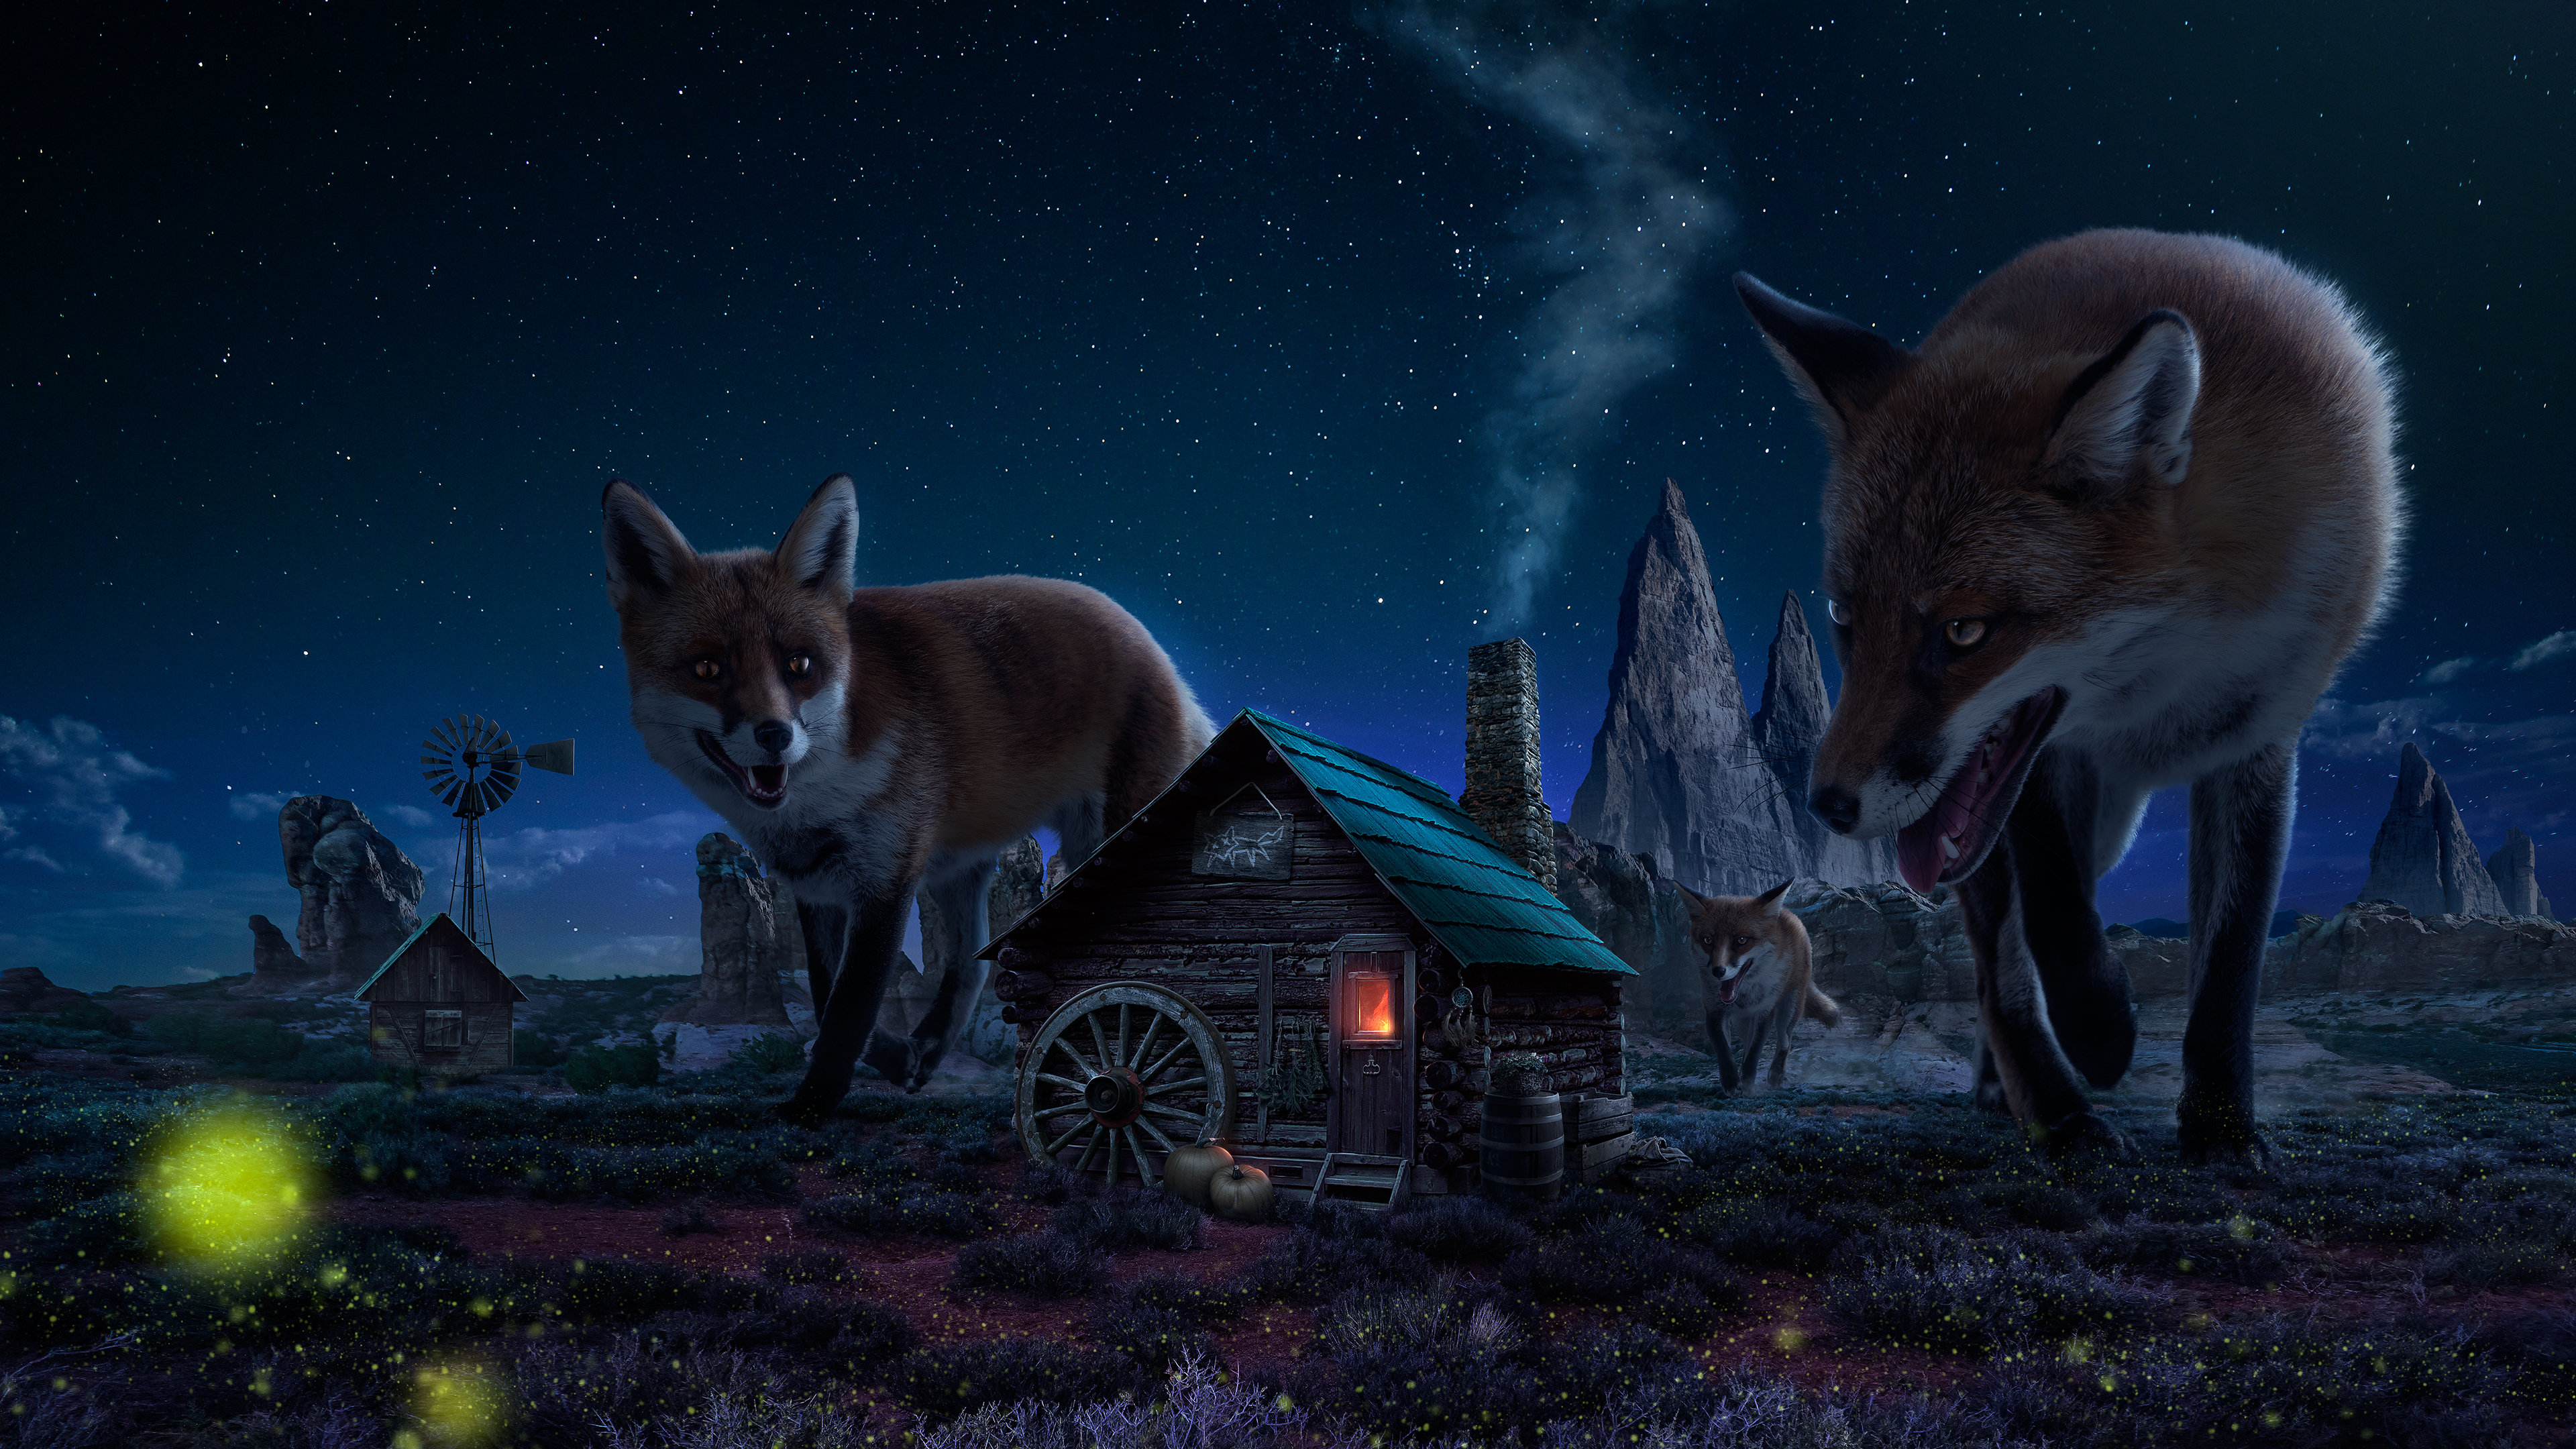 Fantasy animal wallpapers 3840x2160 ultra hd 4k desktop - Ultra hd animal wallpapers ...